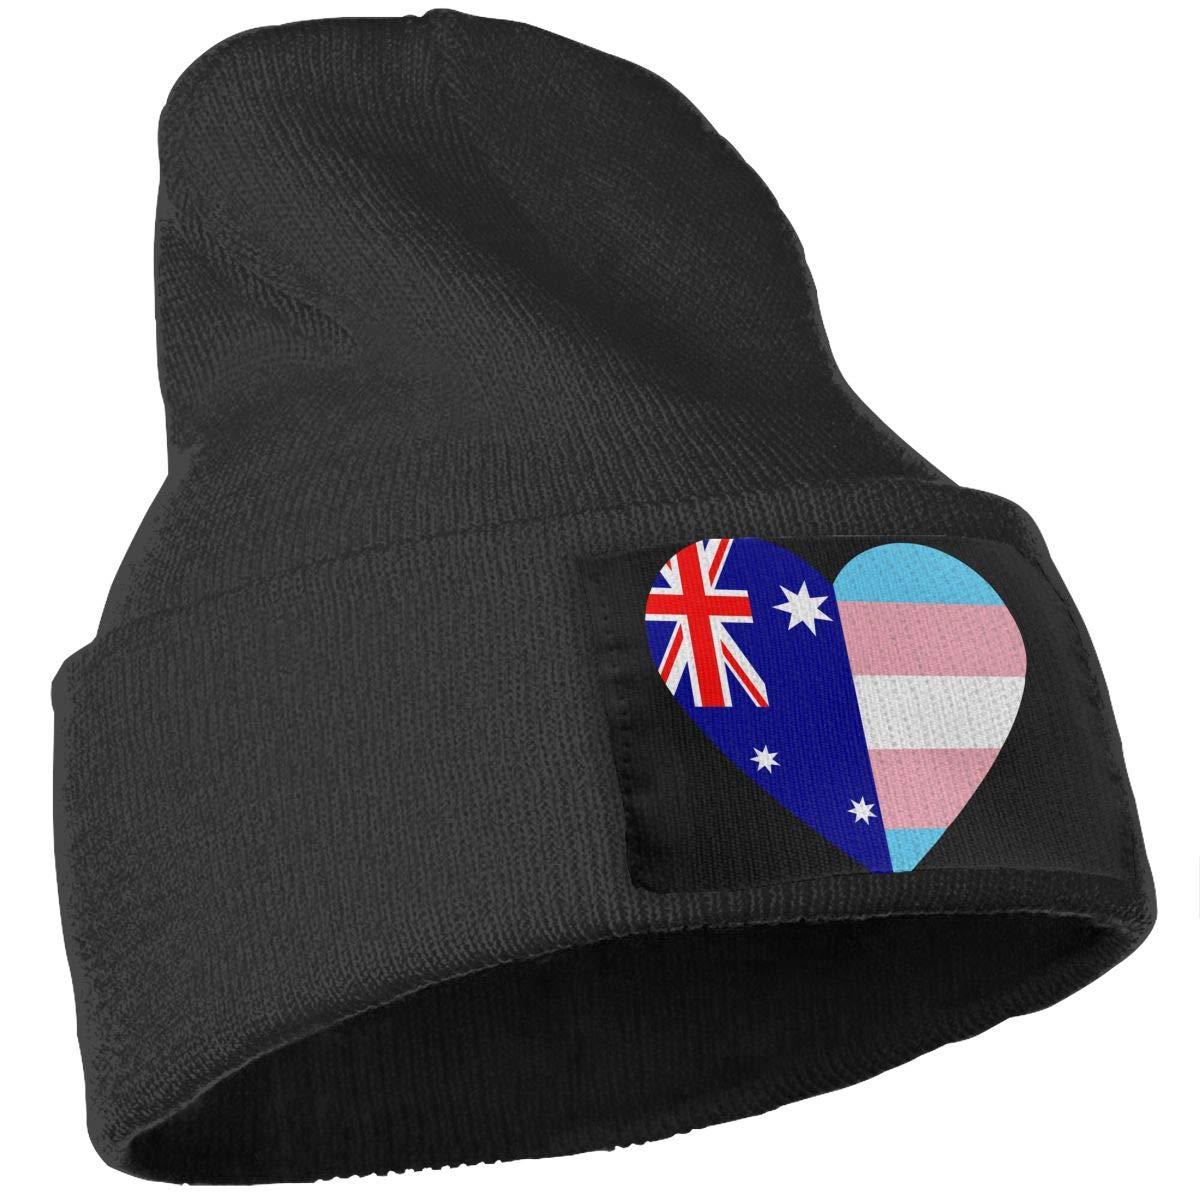 Stretchy /& Soft Winter Ski Skull Caps Australian Flag Transgender Pride Flag Heart Unisex Solid Color Knit Beanie Hat